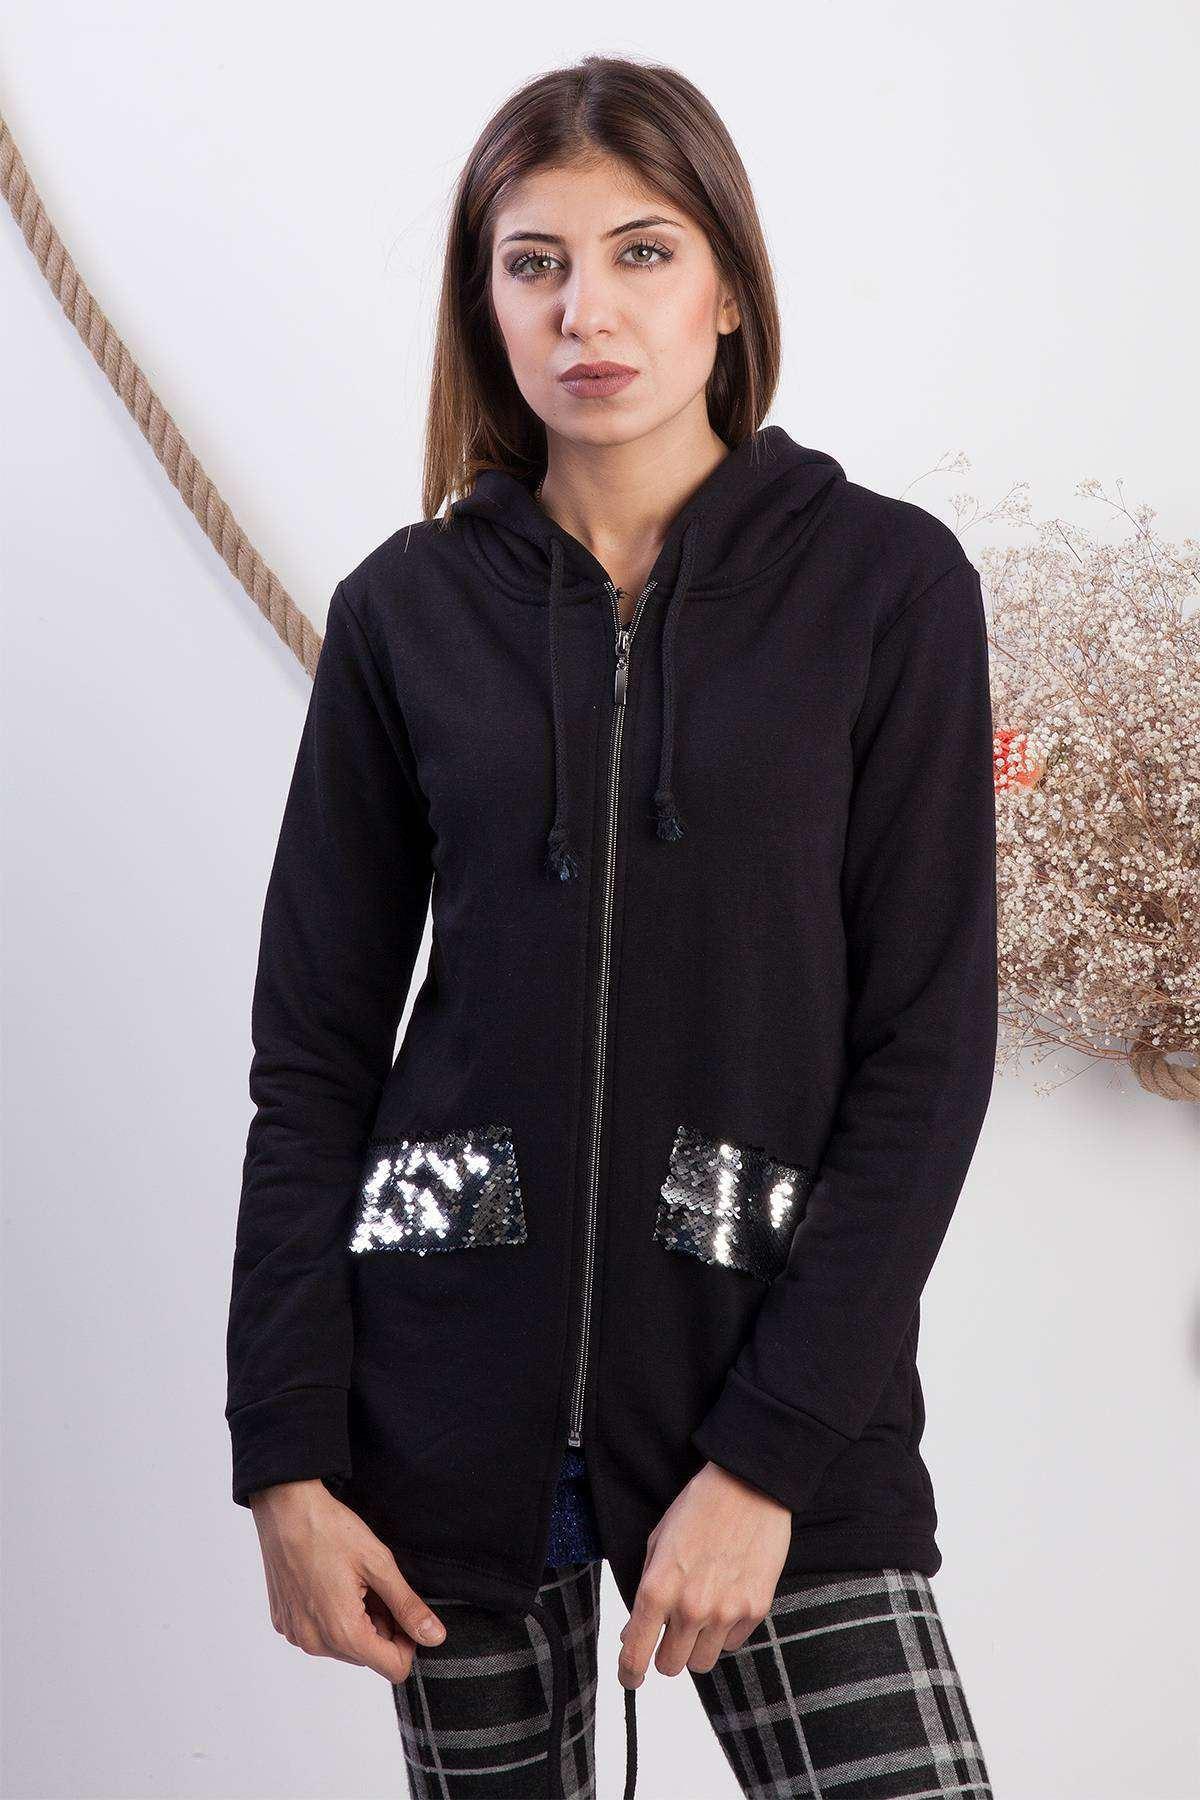 Pul Detaylı Uzun Kapşonlu Sweatshirt Siyah